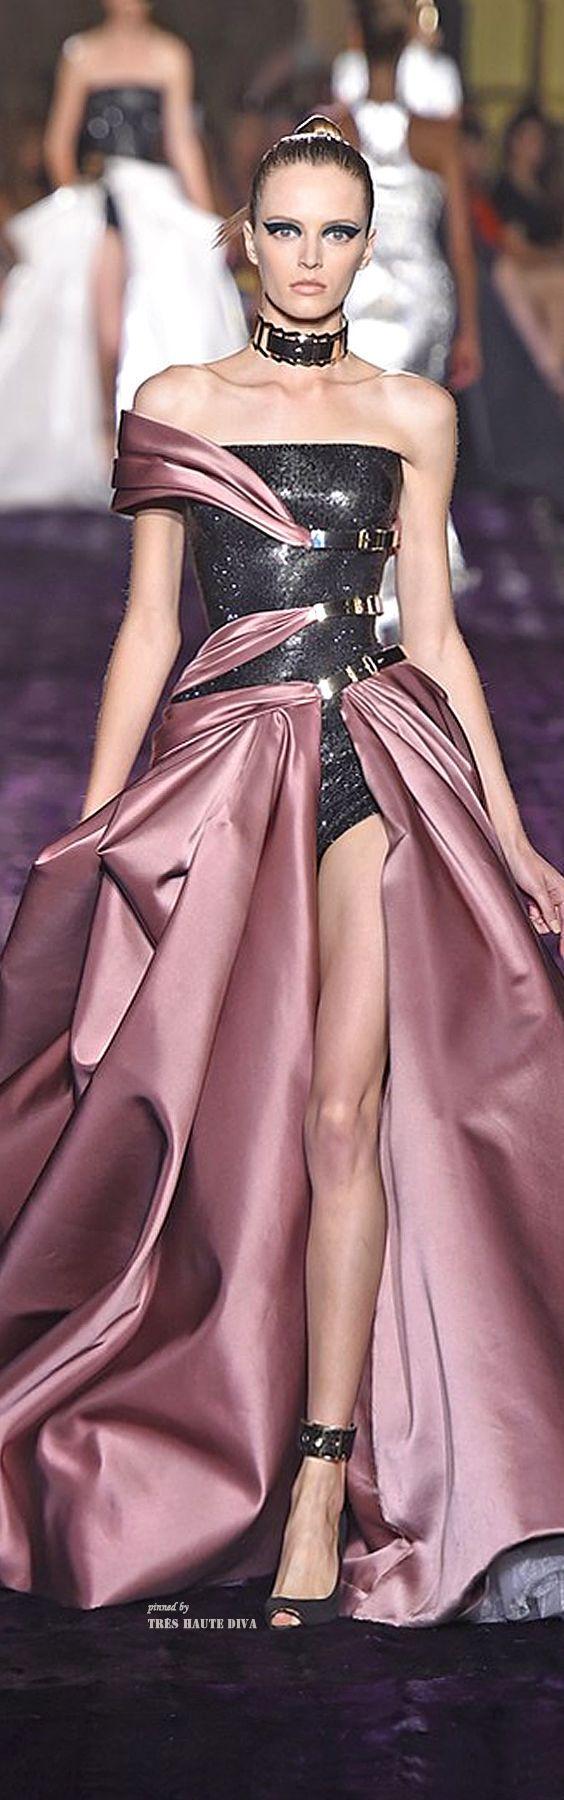 Atelier Versace Fall 2014 Couture ♔ Haute Couture Week Paris - ♔LadyLuxury♔